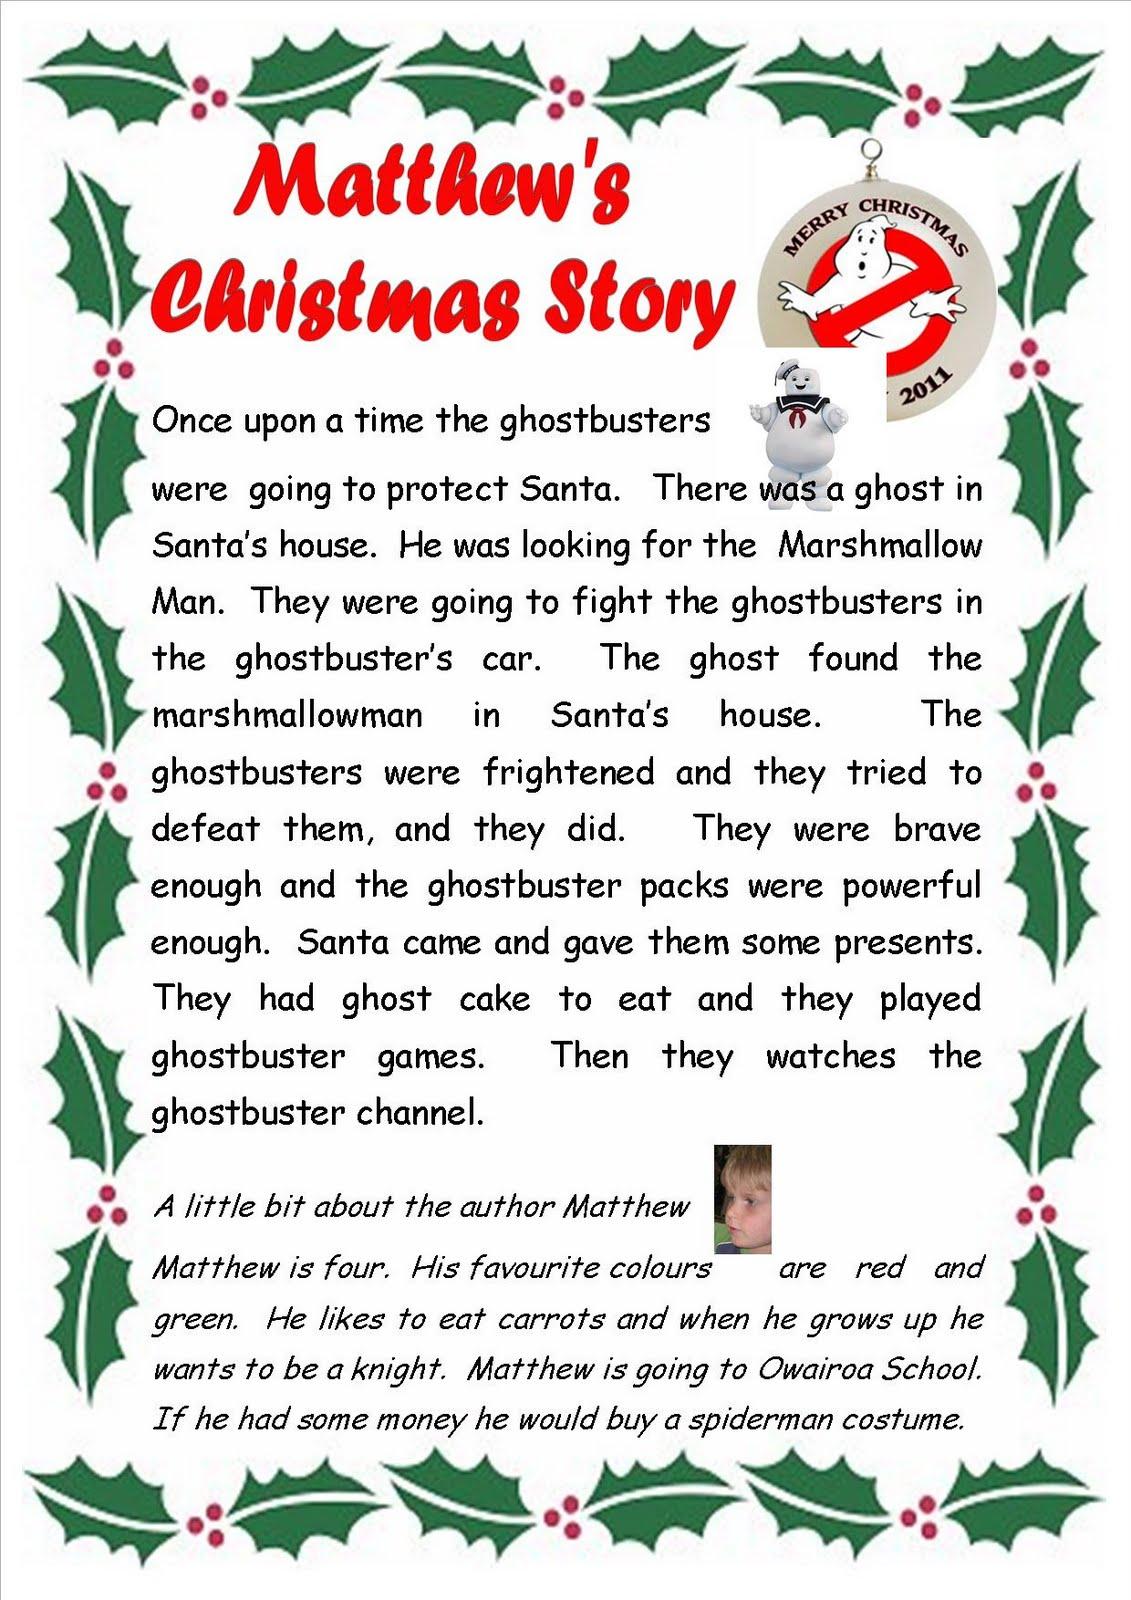 BDK Community: Some christmas stories